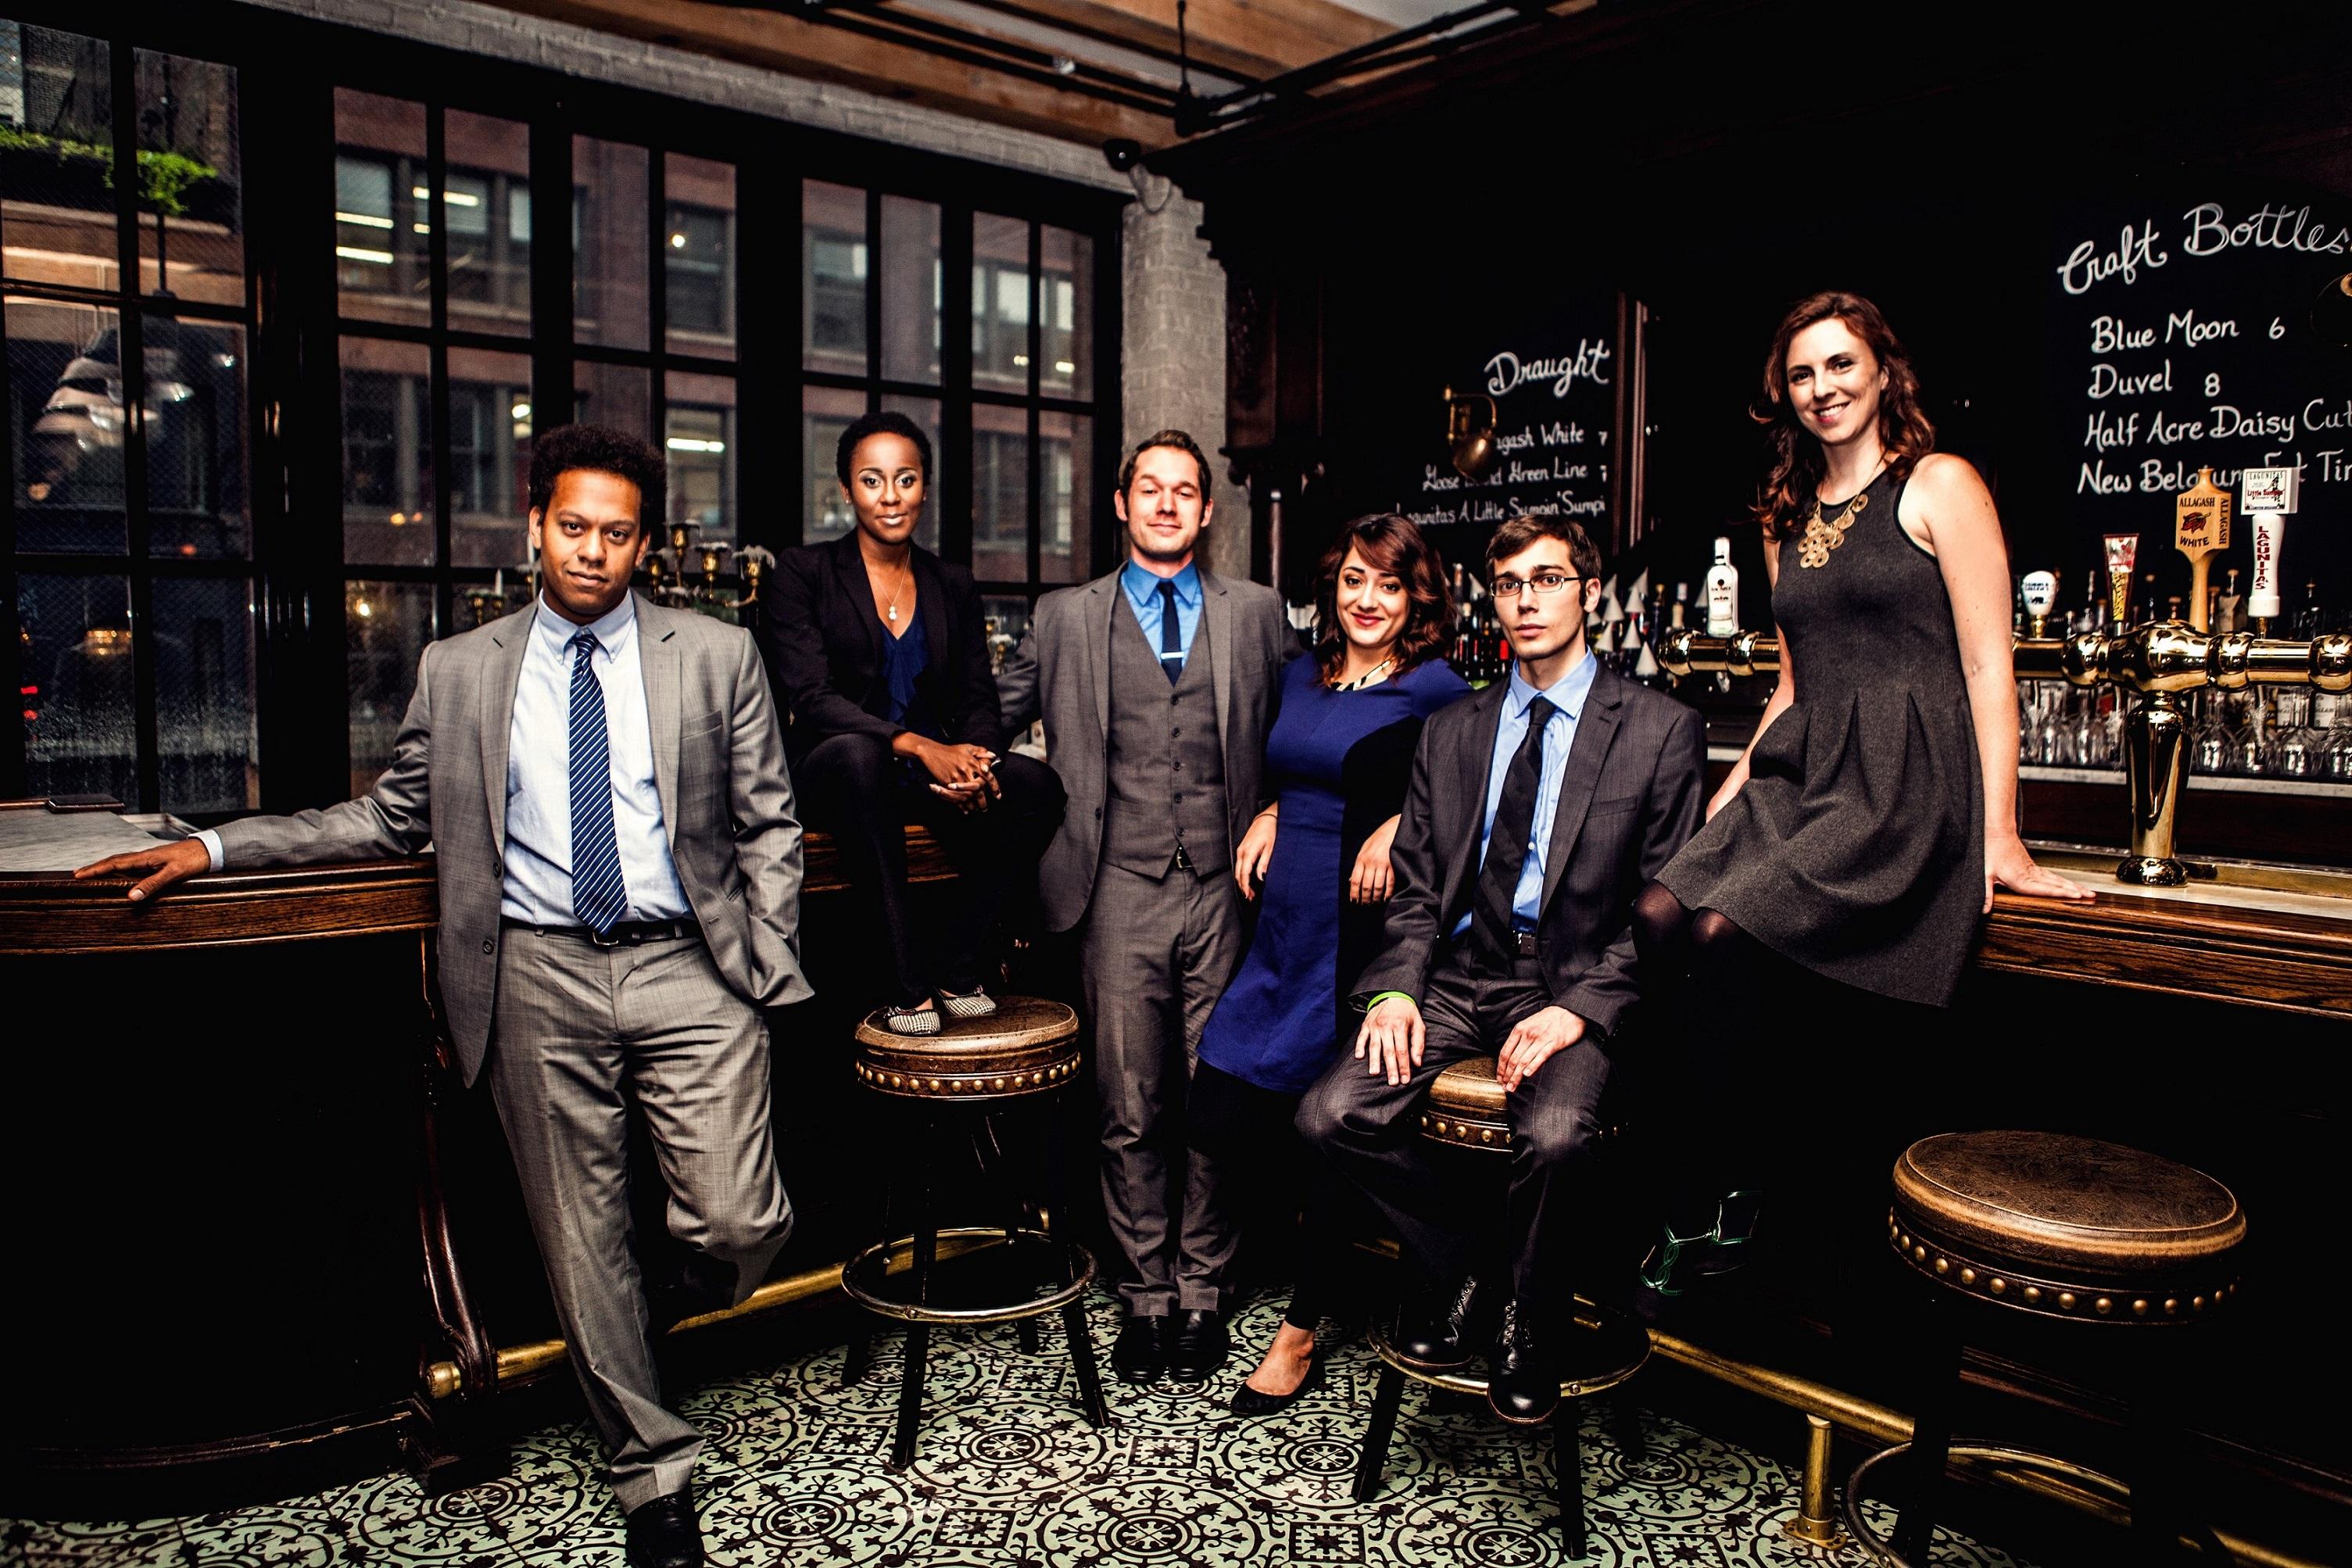 (l to r) John Thibodeaux, Lisa Beasley, Scott Morehead, Marlena Rodriguez, Alan Linic, Liz Reuss/Photo:Kirsten Miccoli